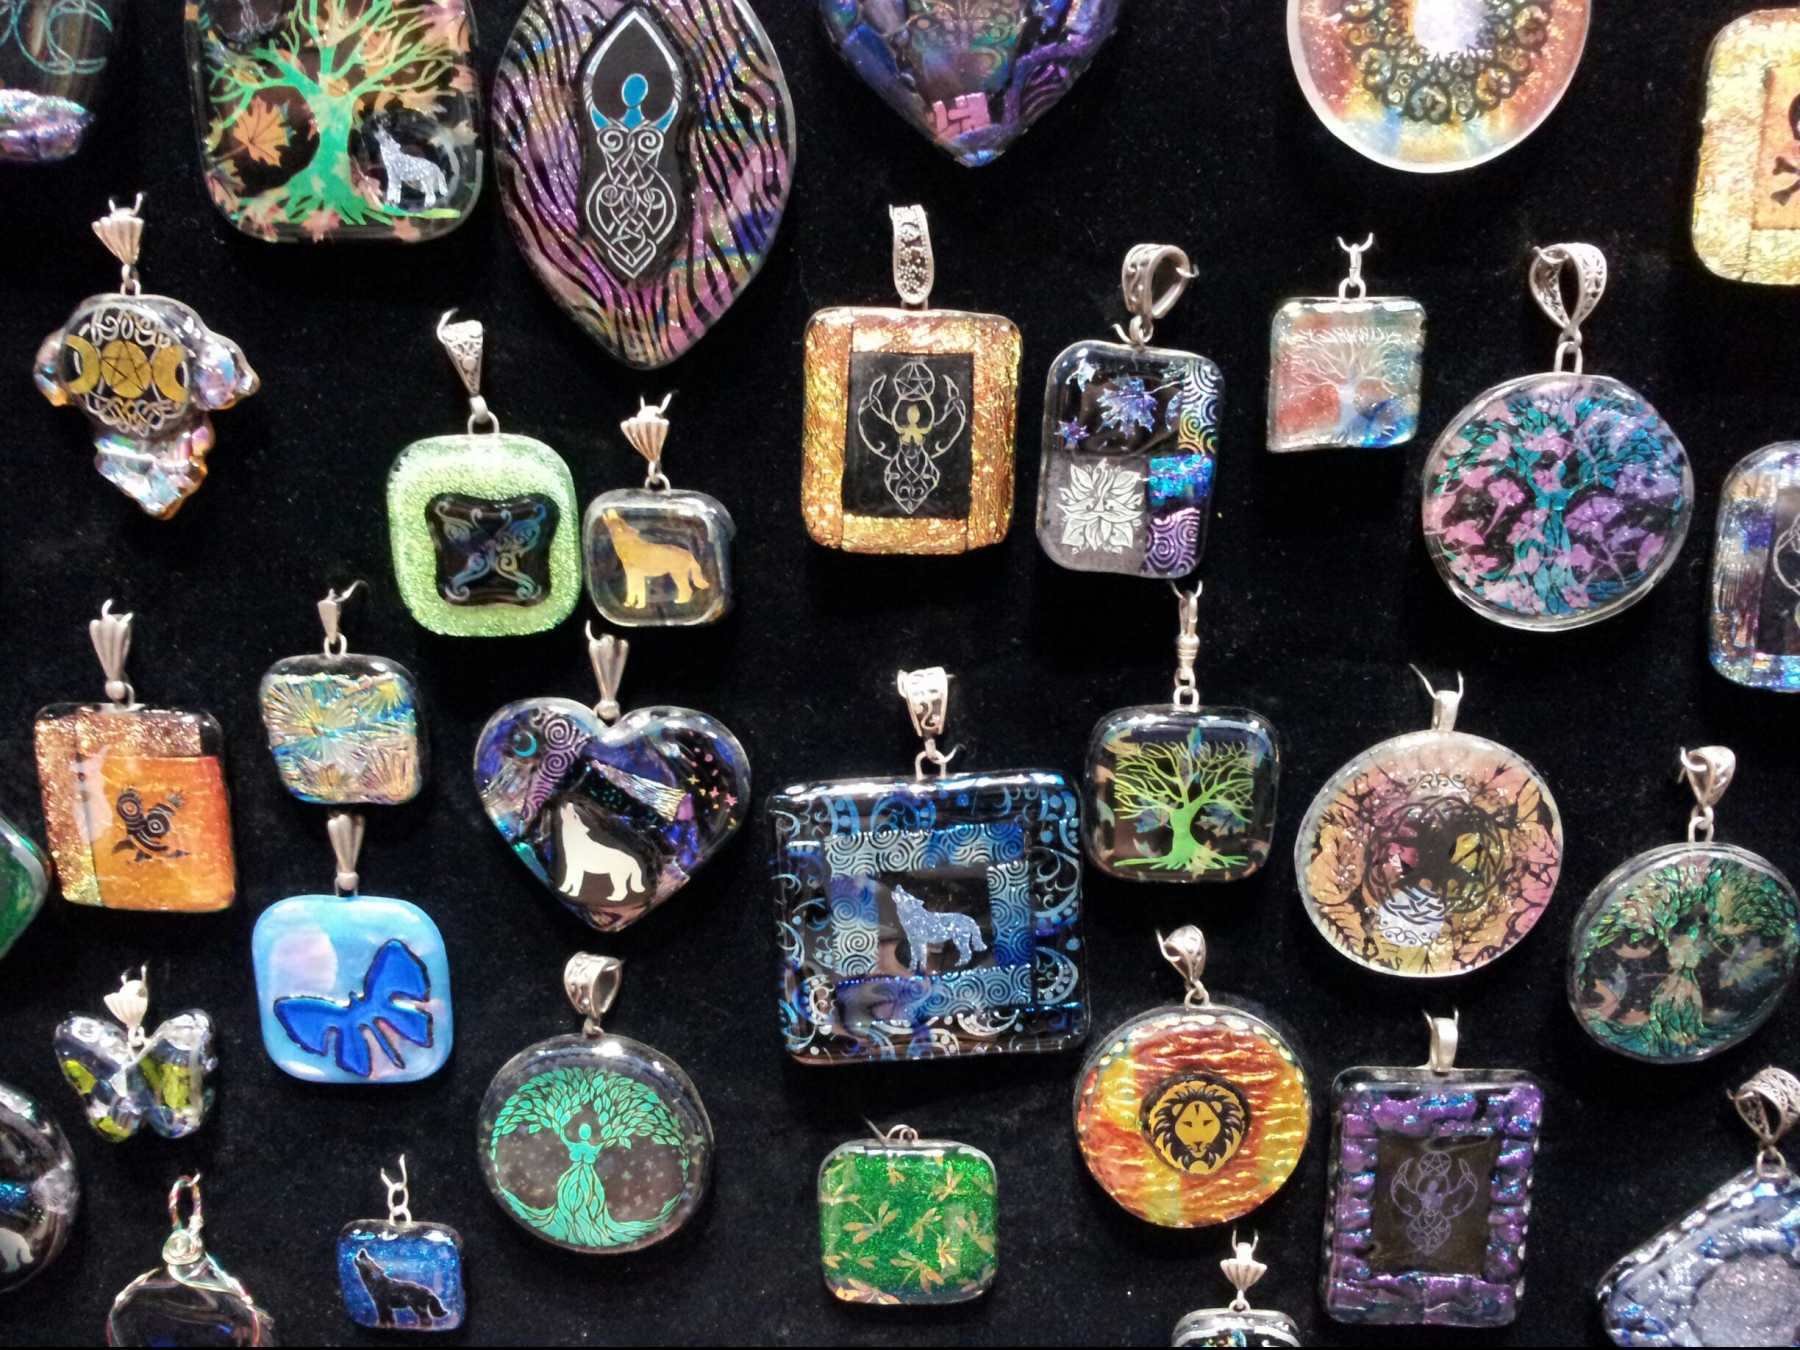 GenCon 2014: A Gathering Of Beautiful Artistic Displays | gencon